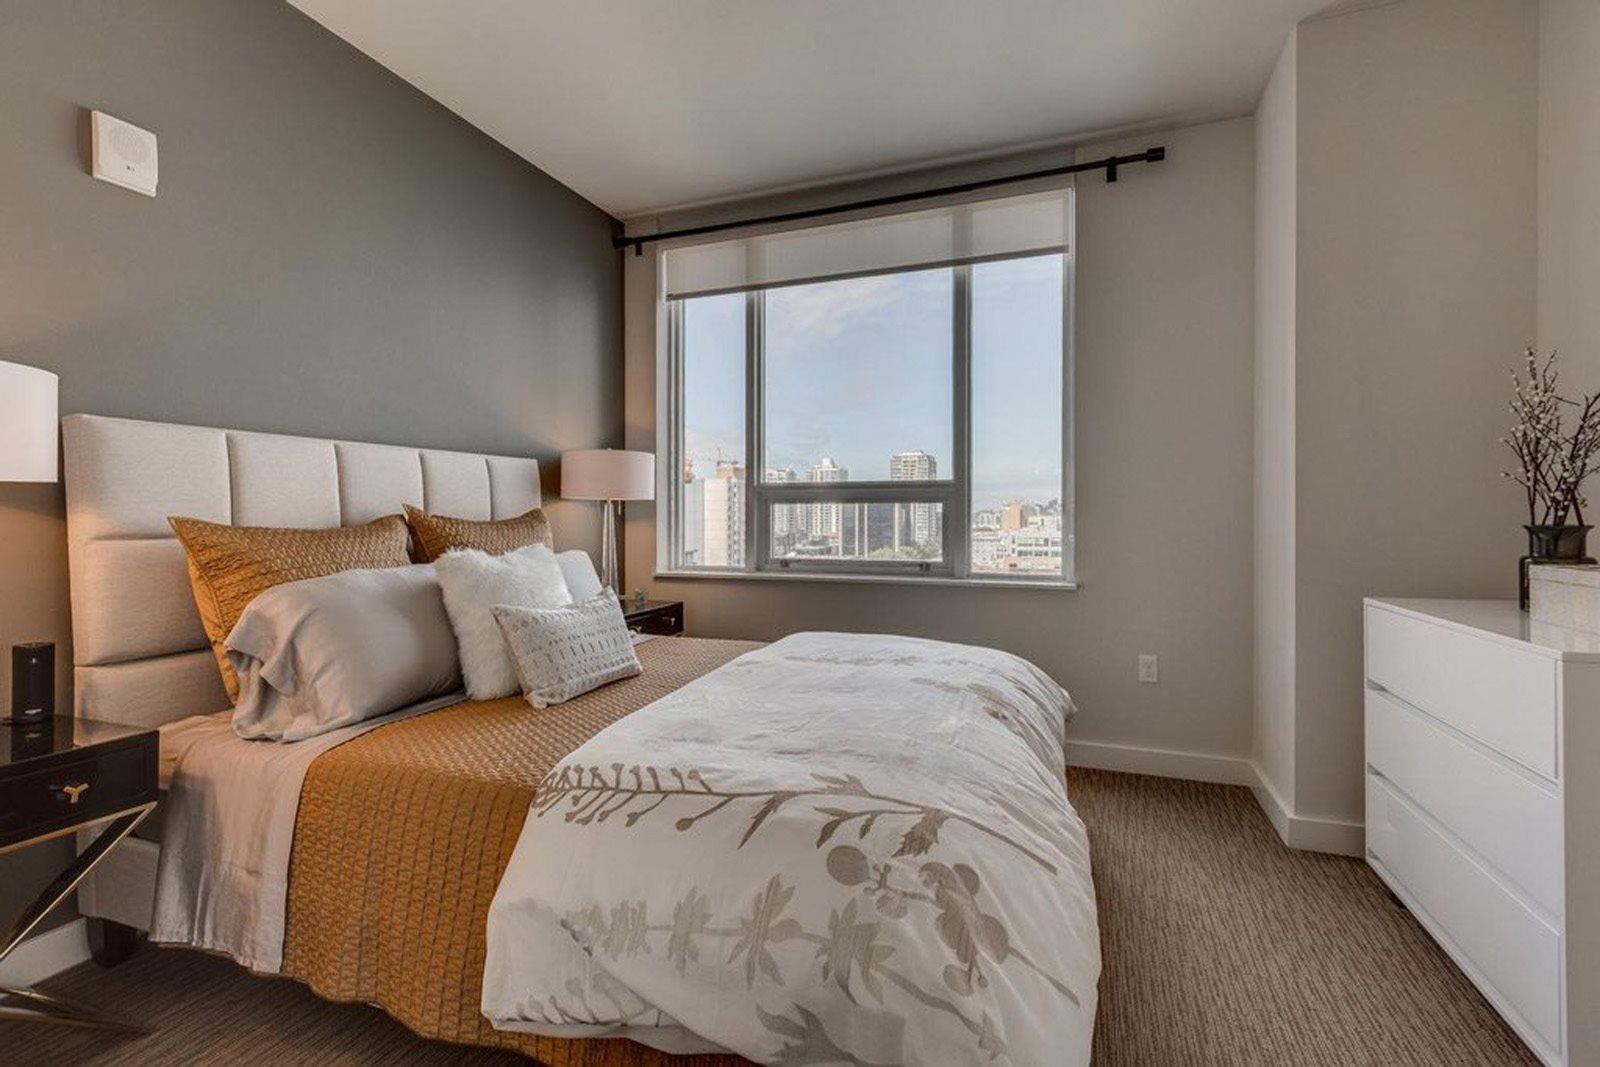 Master Bedroom at The Martin, Seattle, Washington